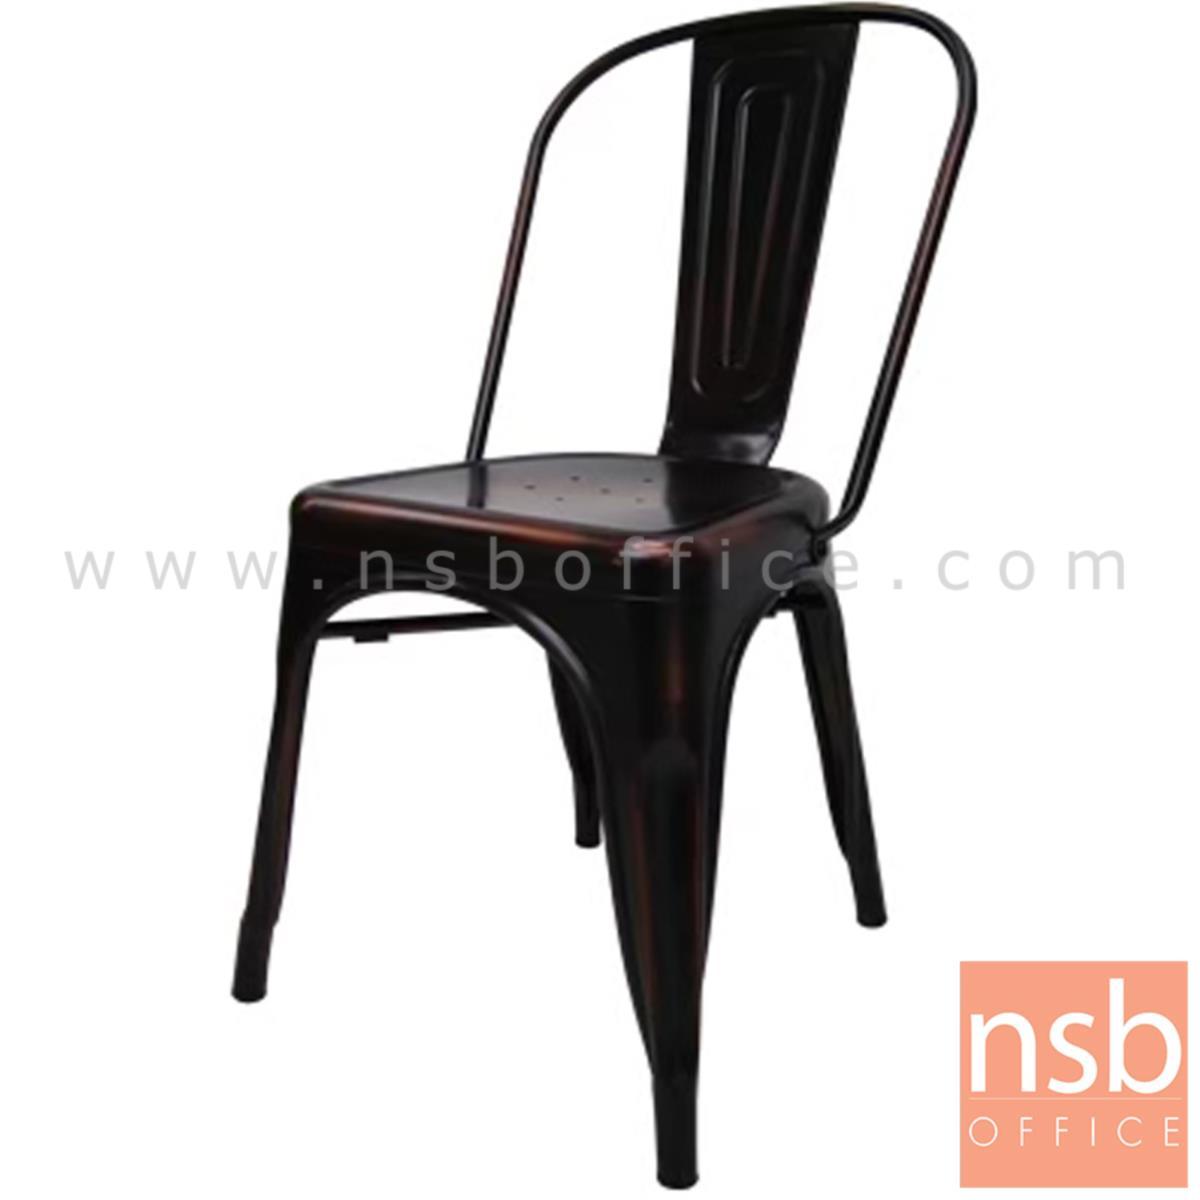 B29A321:เก้าอี้โมเดิร์นเหล็ก รุ่น Blue Star